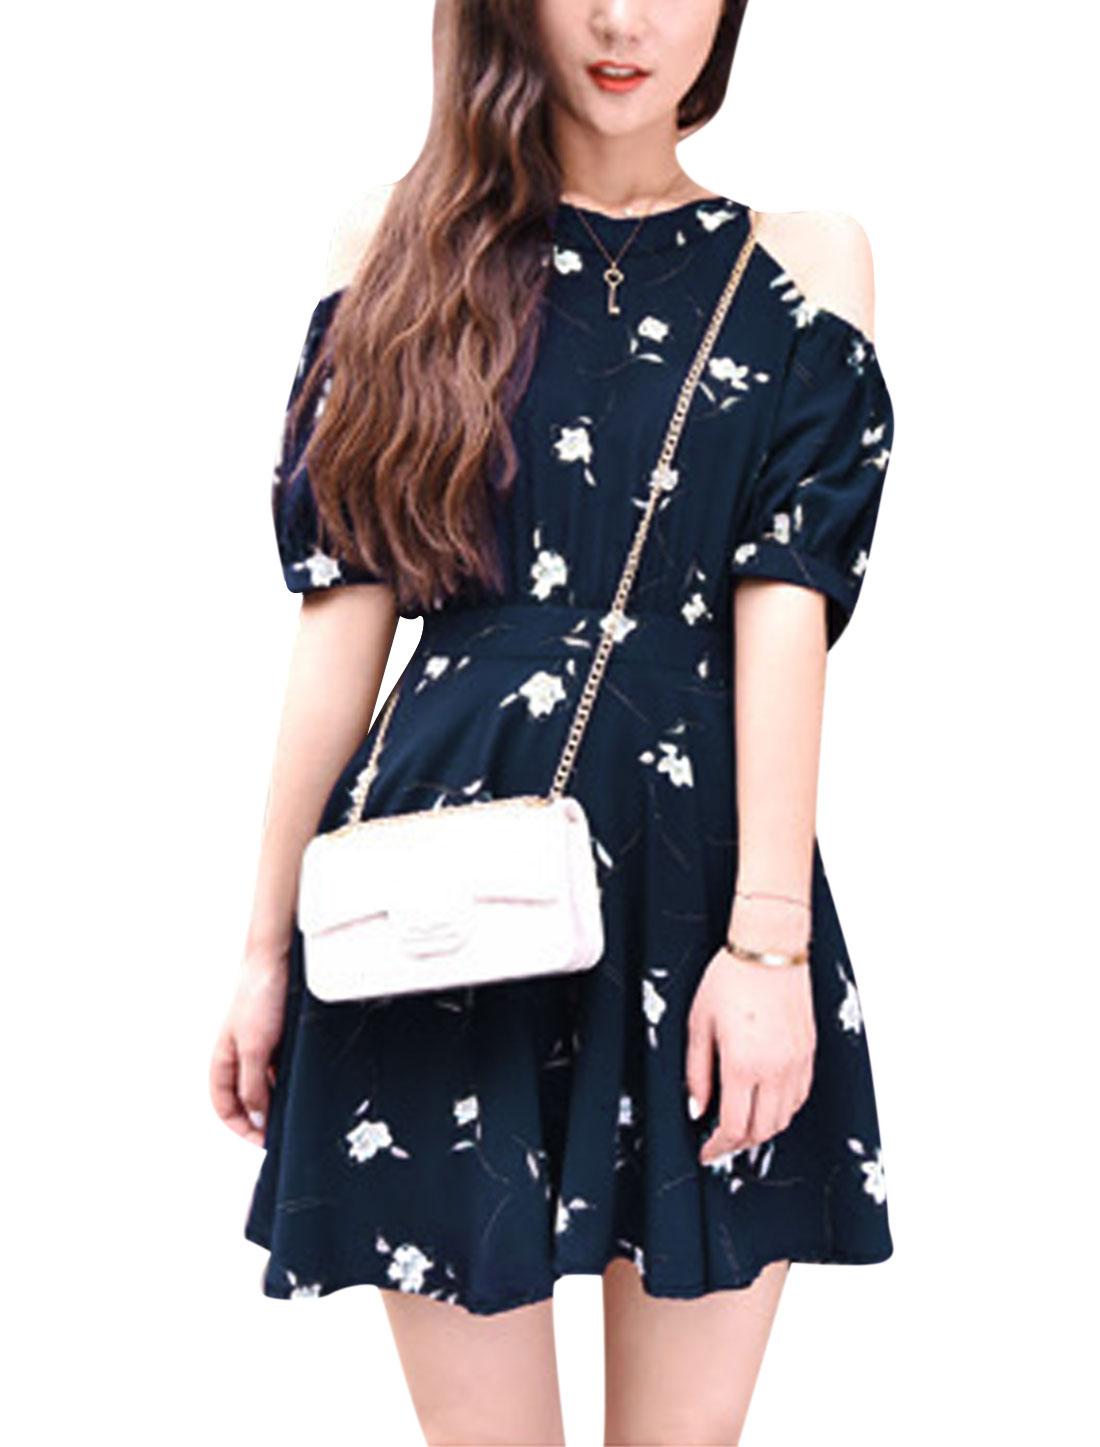 Woman Floral Prints Halter Neck Cut Out Shoulder Chiffon Dress Dark Blue XS